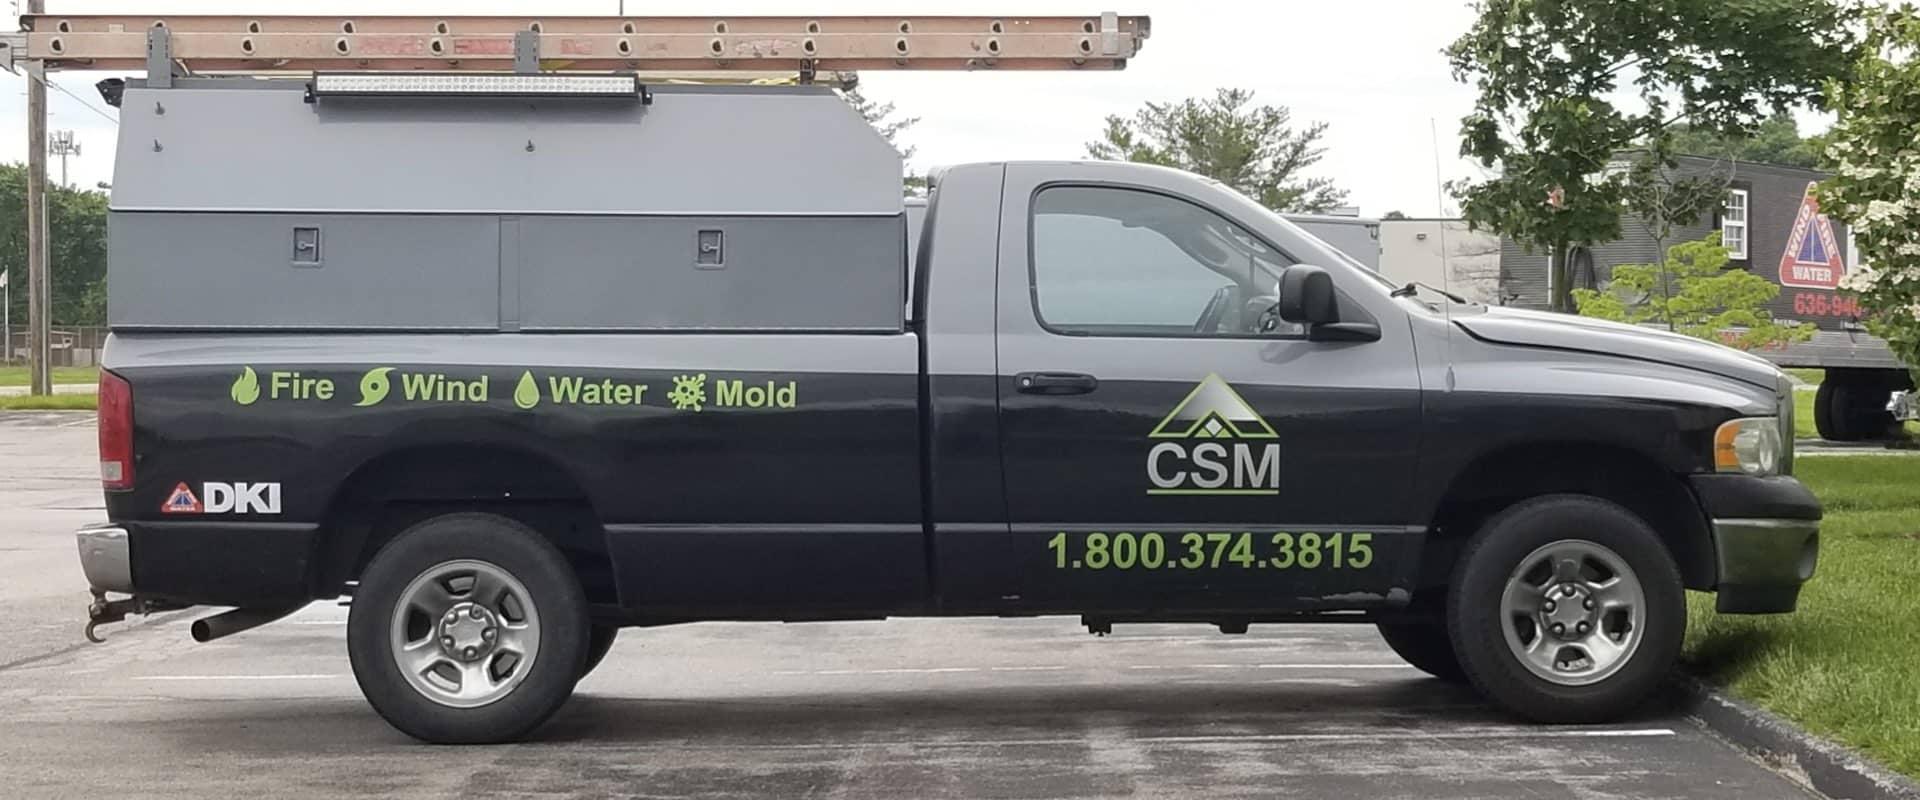 fire wind water mold restoration